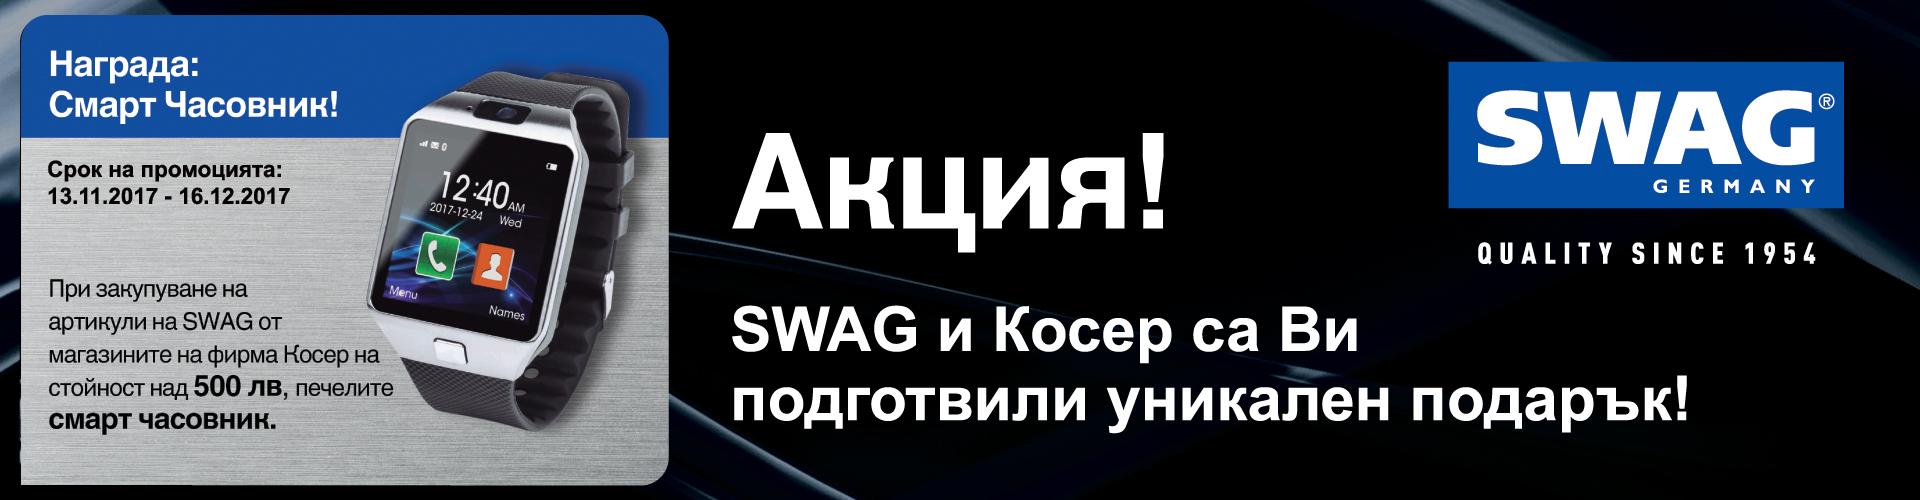 promo_swag_nov-dec_2017_banner.jpg